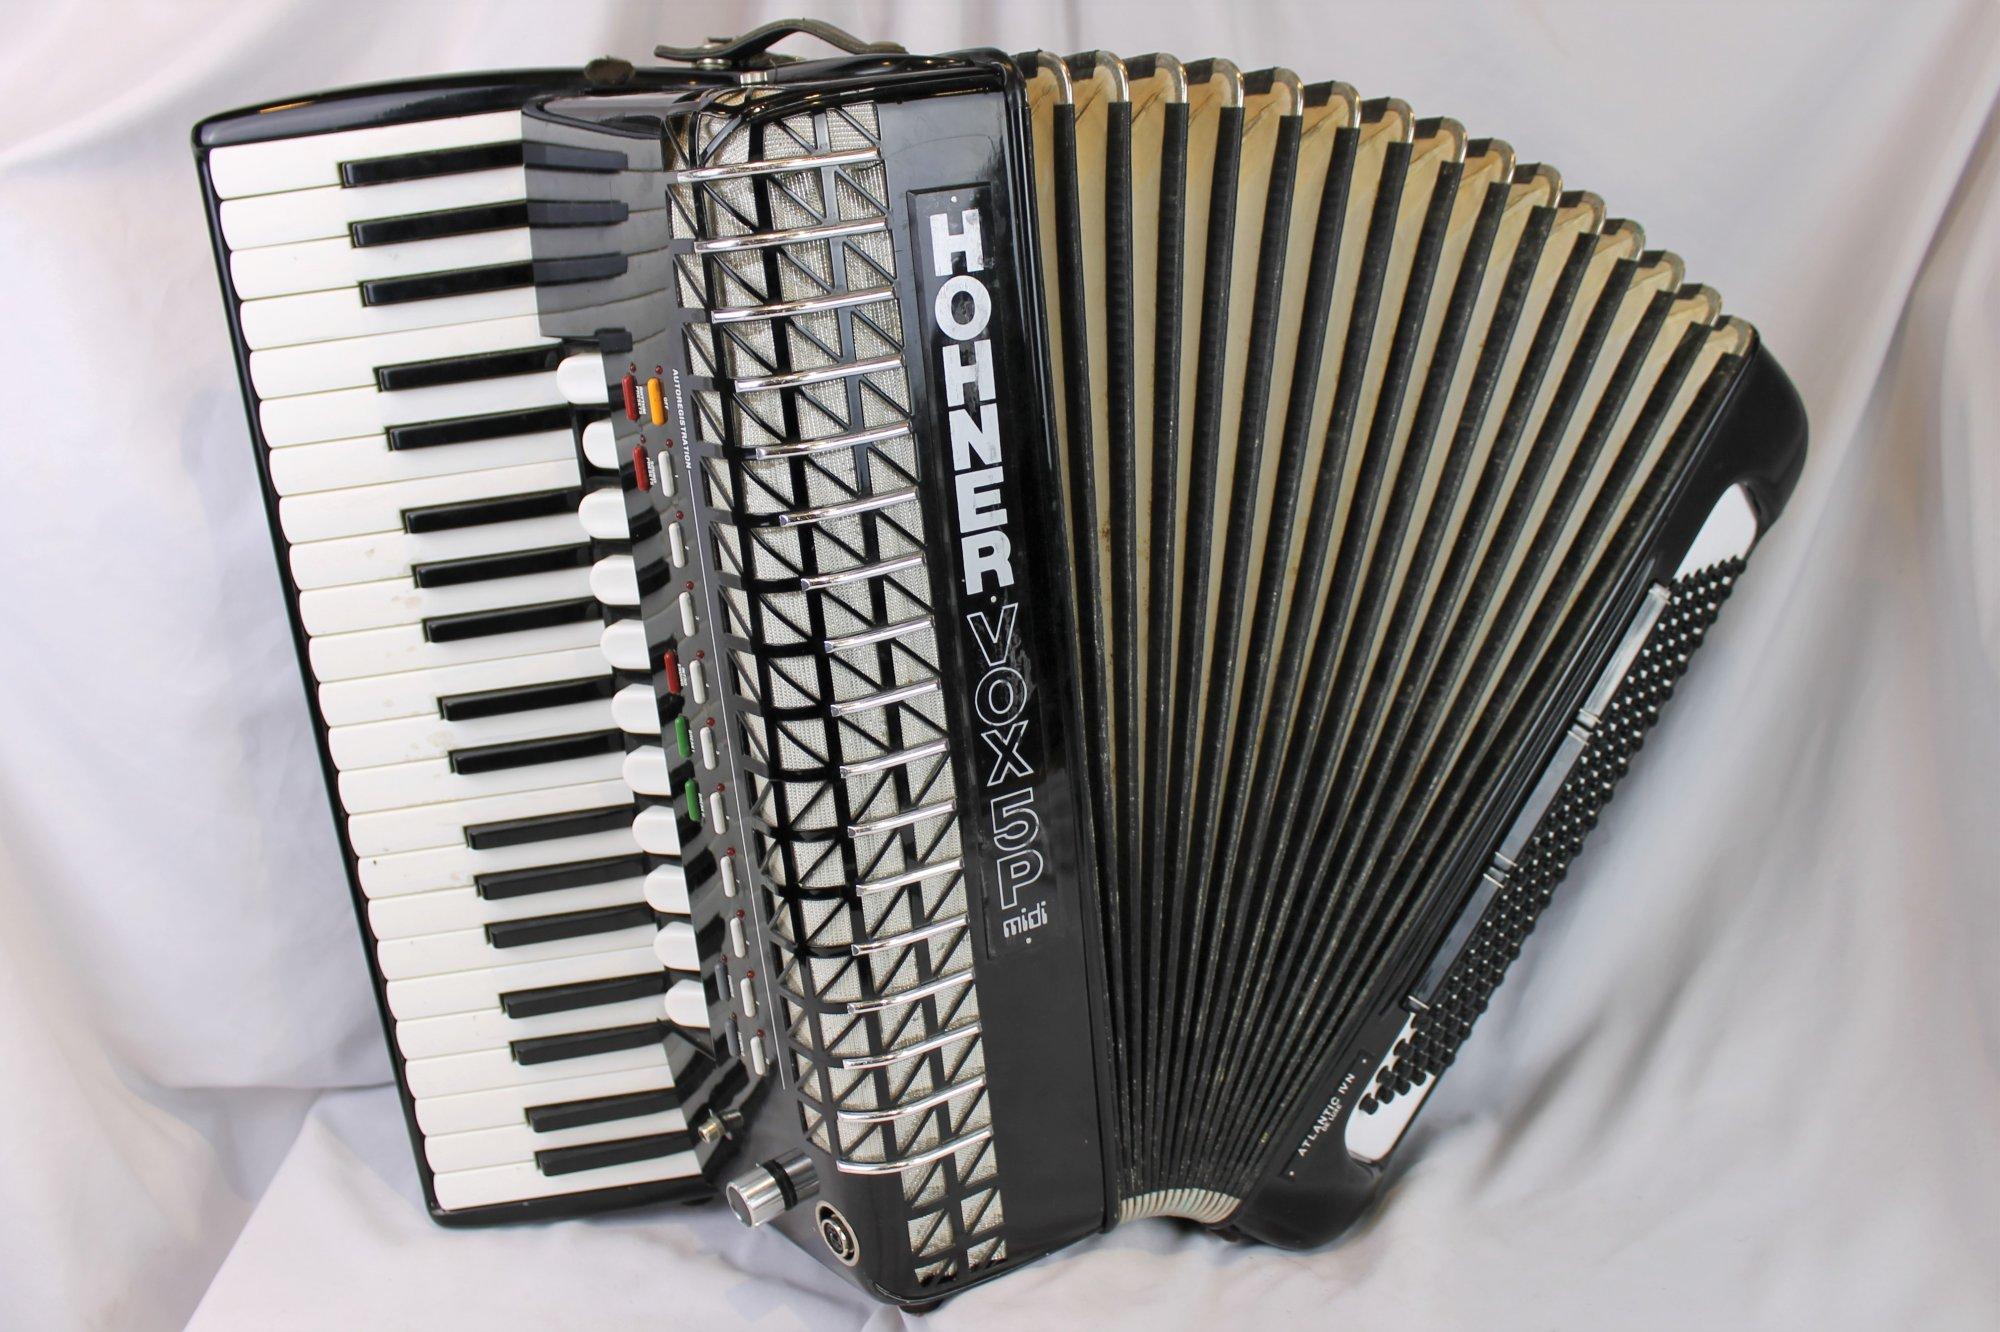 4620 - Black Hohner Atlantic IVN Vox 5P Piano Accordion LMMH 41 120